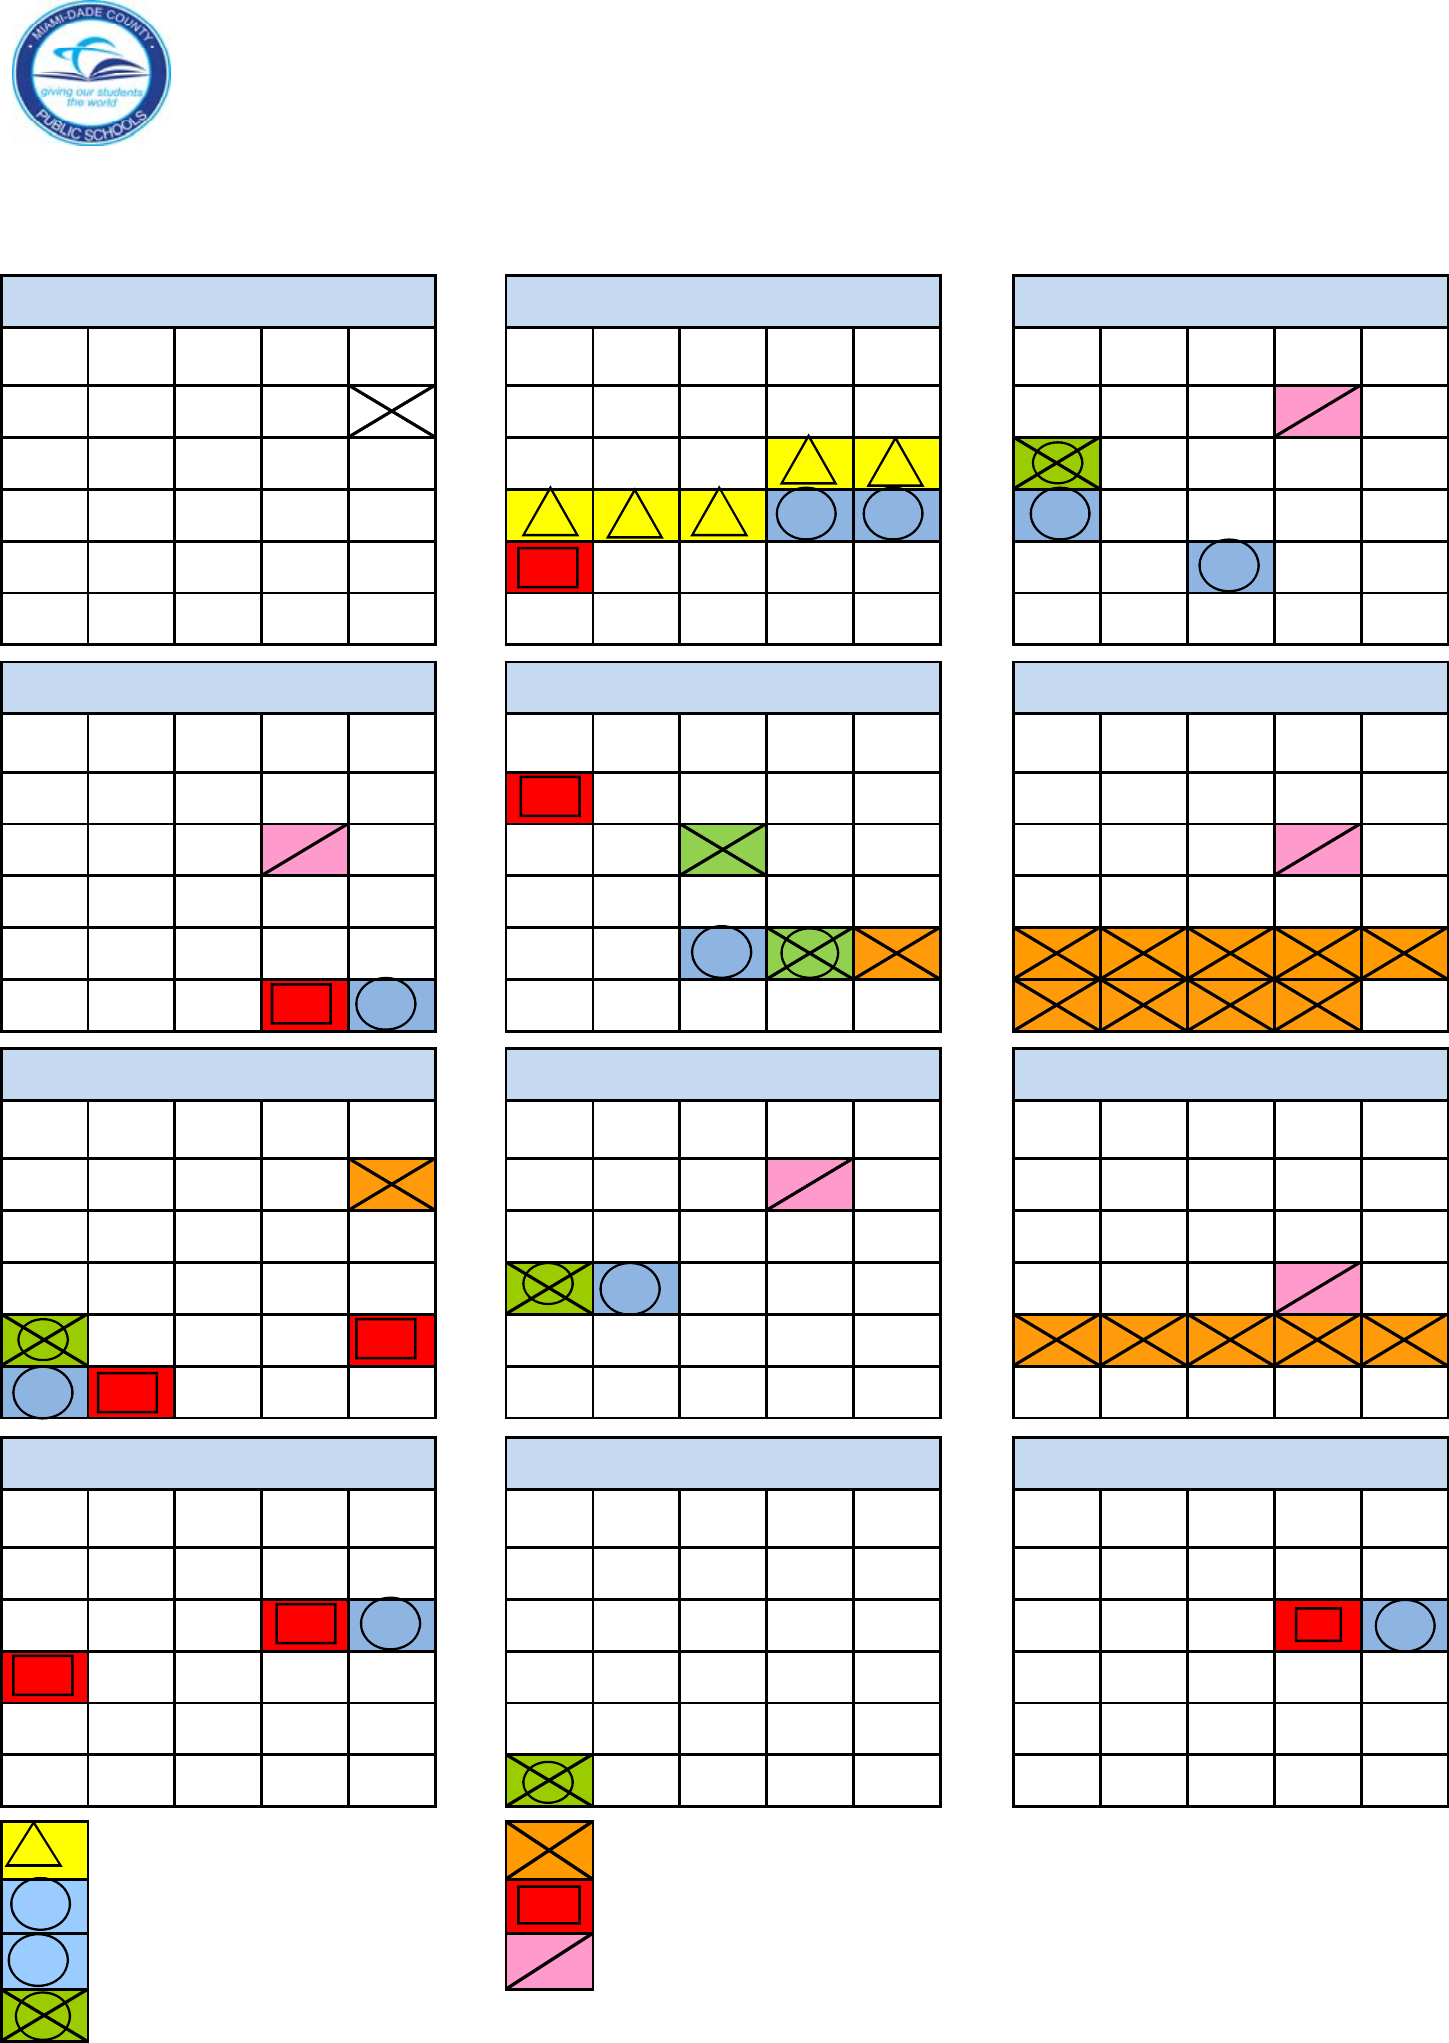 2015-2016 School Calendar - Dade County, Miami Free Download